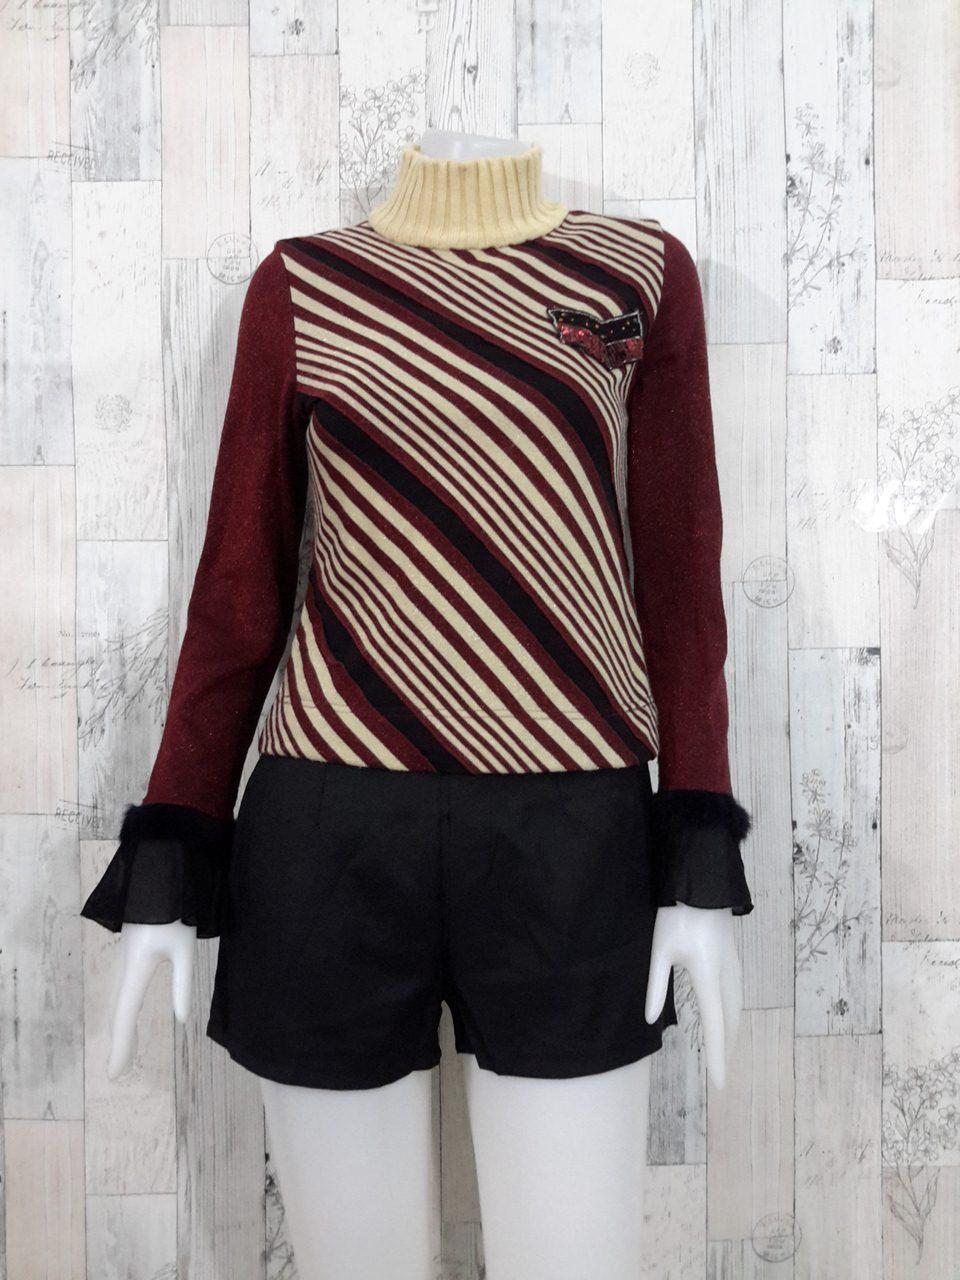 Blouse3528 2nd hand clothes เสื้อไหมพรม(เนื้อหนาปานกลาง) แขนยาว คอเต่า อกแต่งอาร์ม ลายริ้วโทนสีครีมเลือดหมู